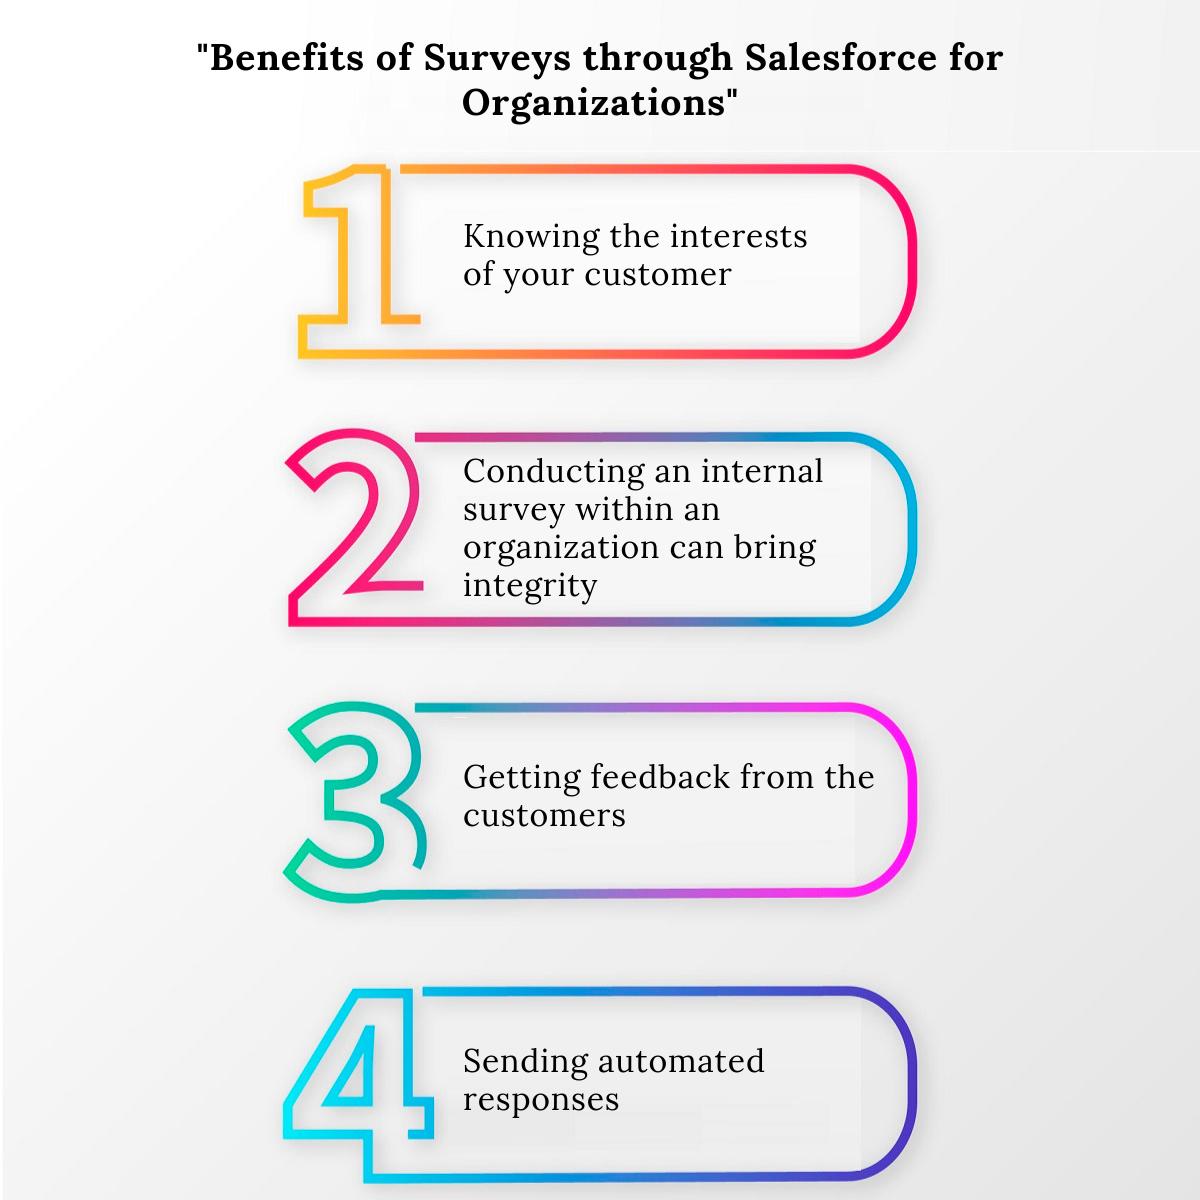 Surveys through Salesforce